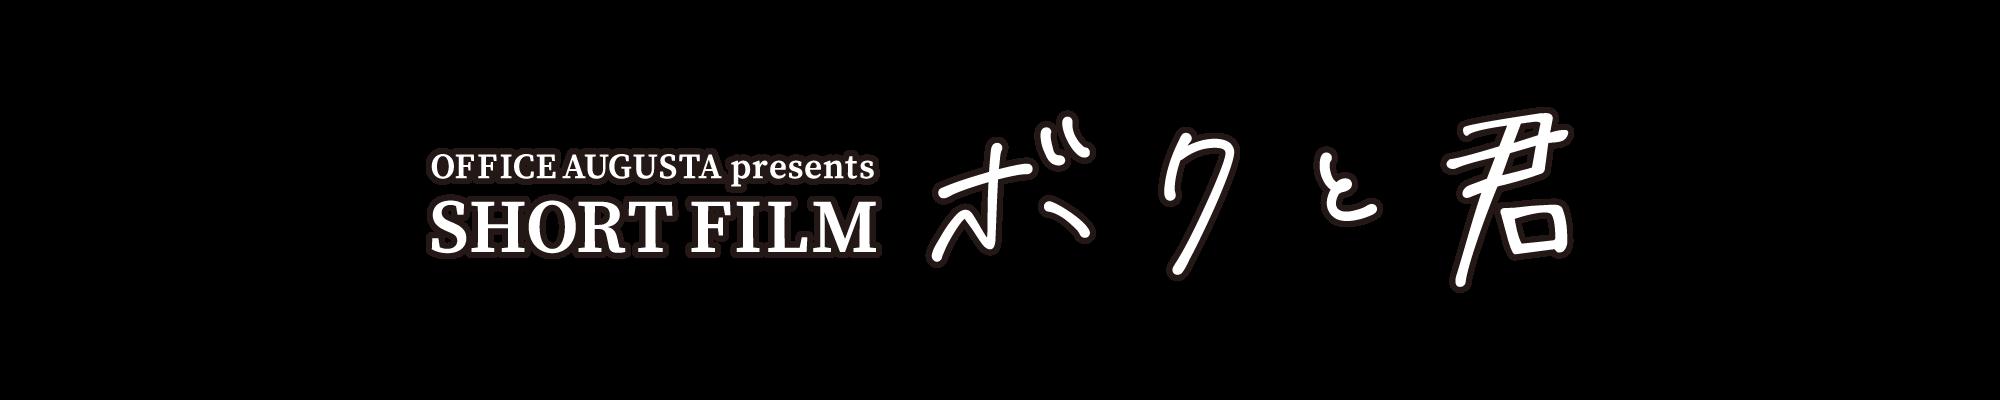 Office Augusta Presents Short Film Boku To Kimi